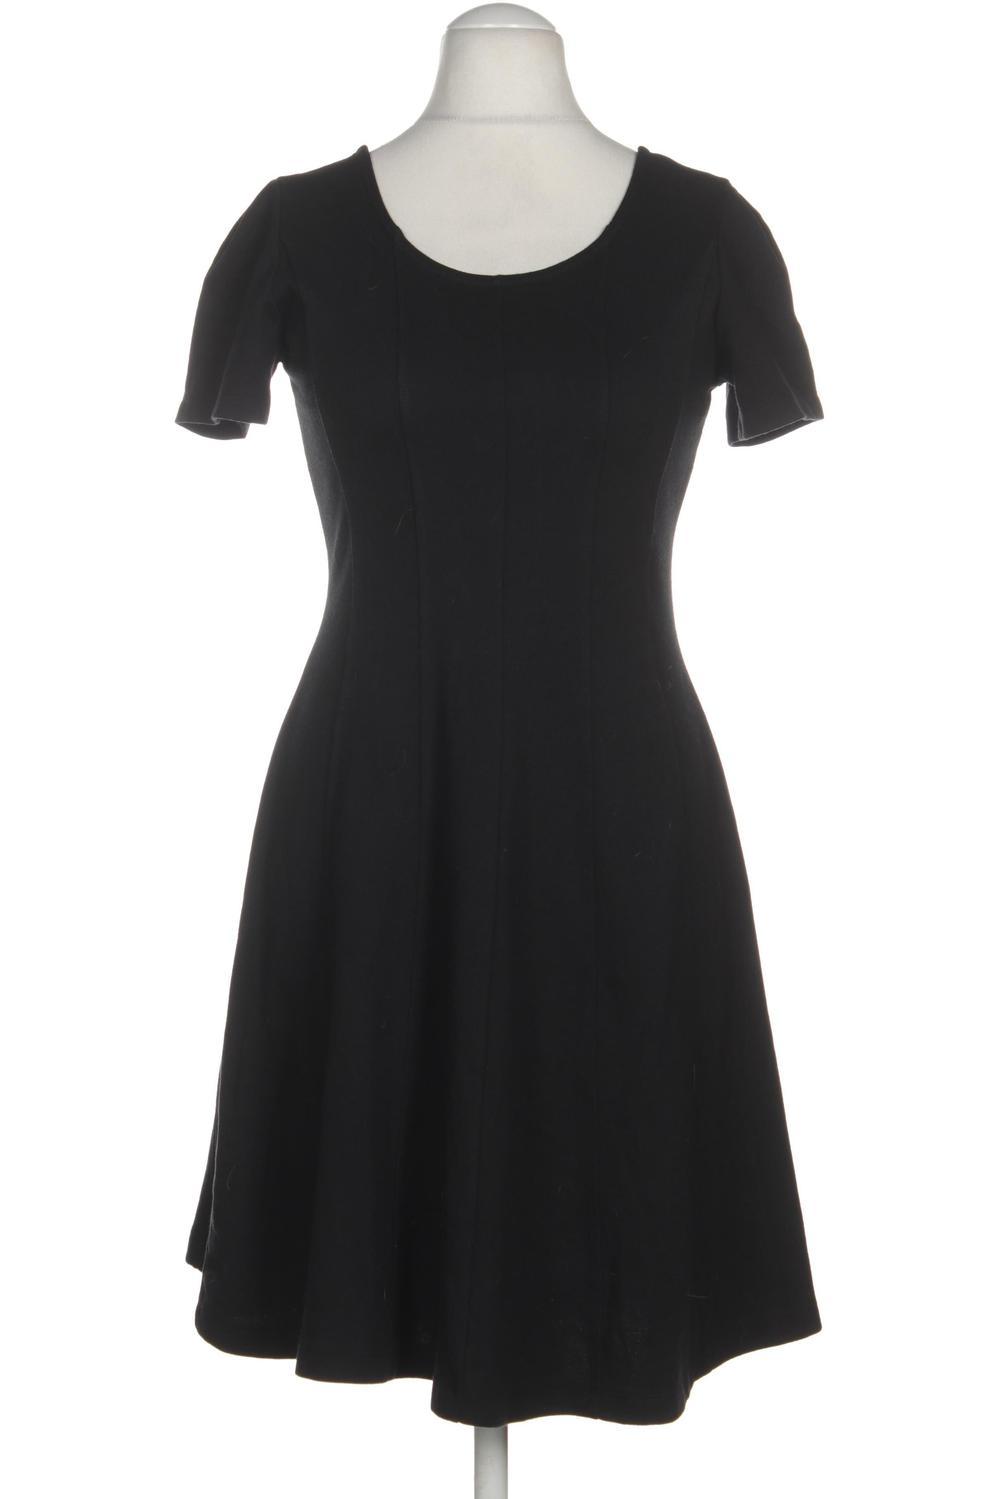 mint & berry kleid damen dress damenkleid gr. m kein etikett